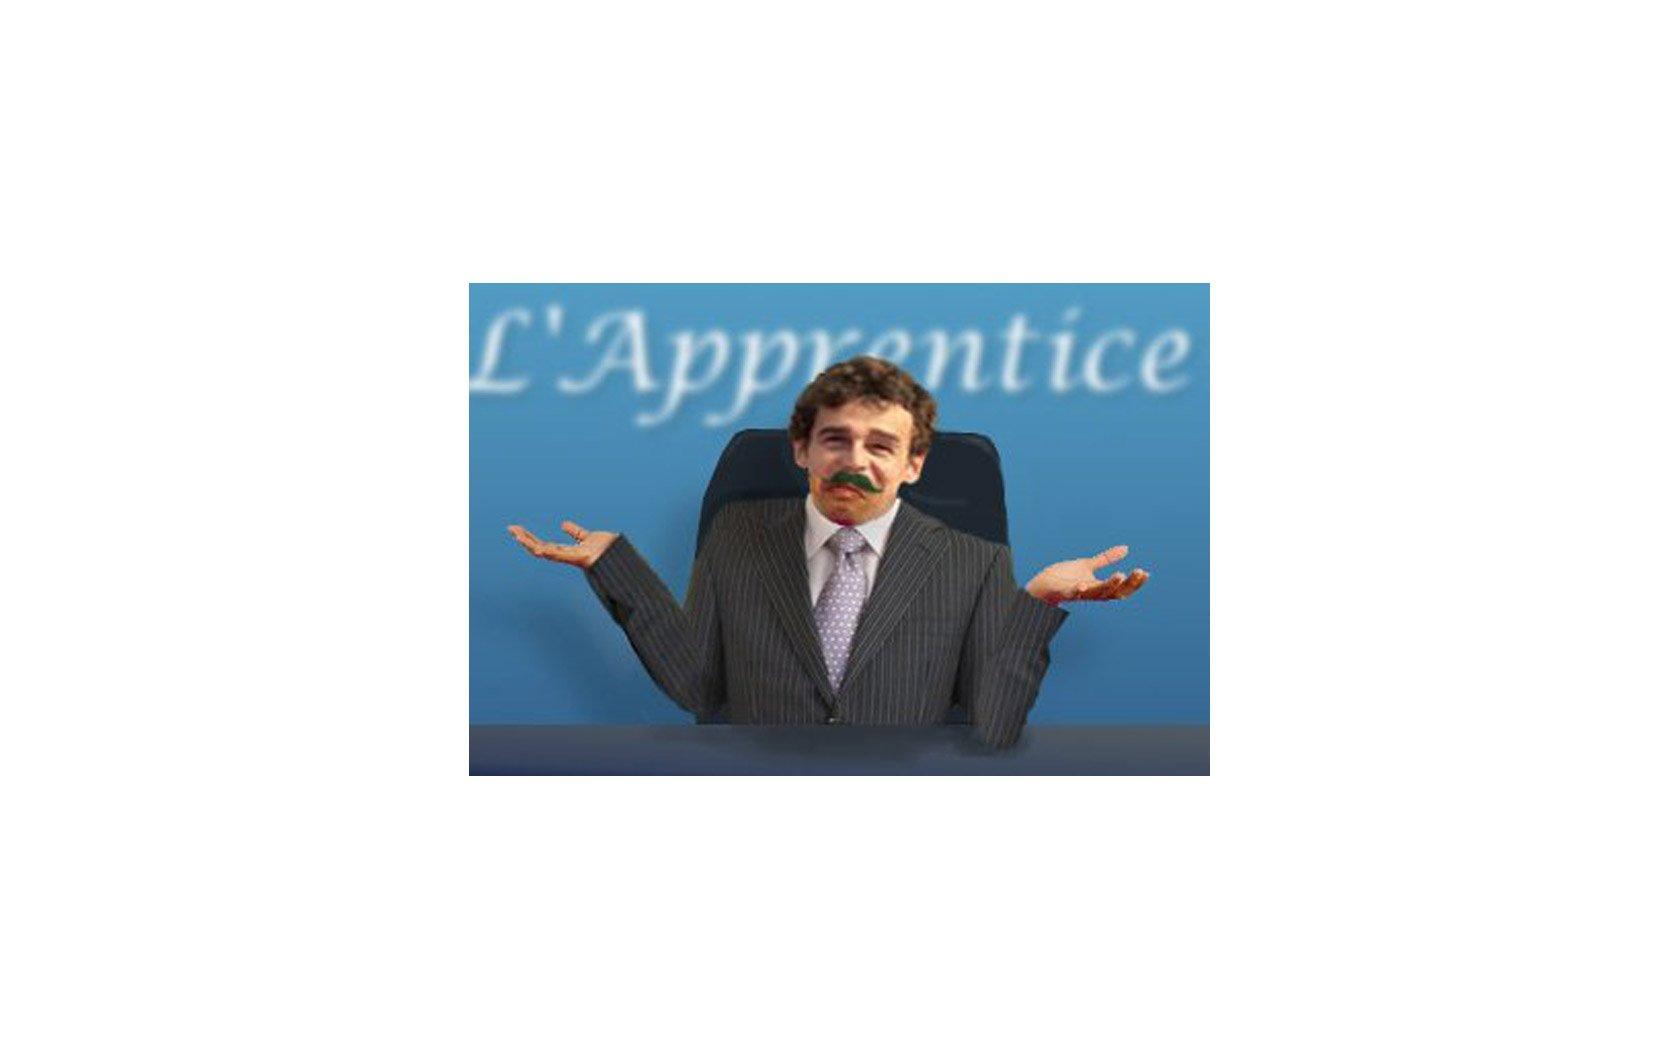 apprentice-satire